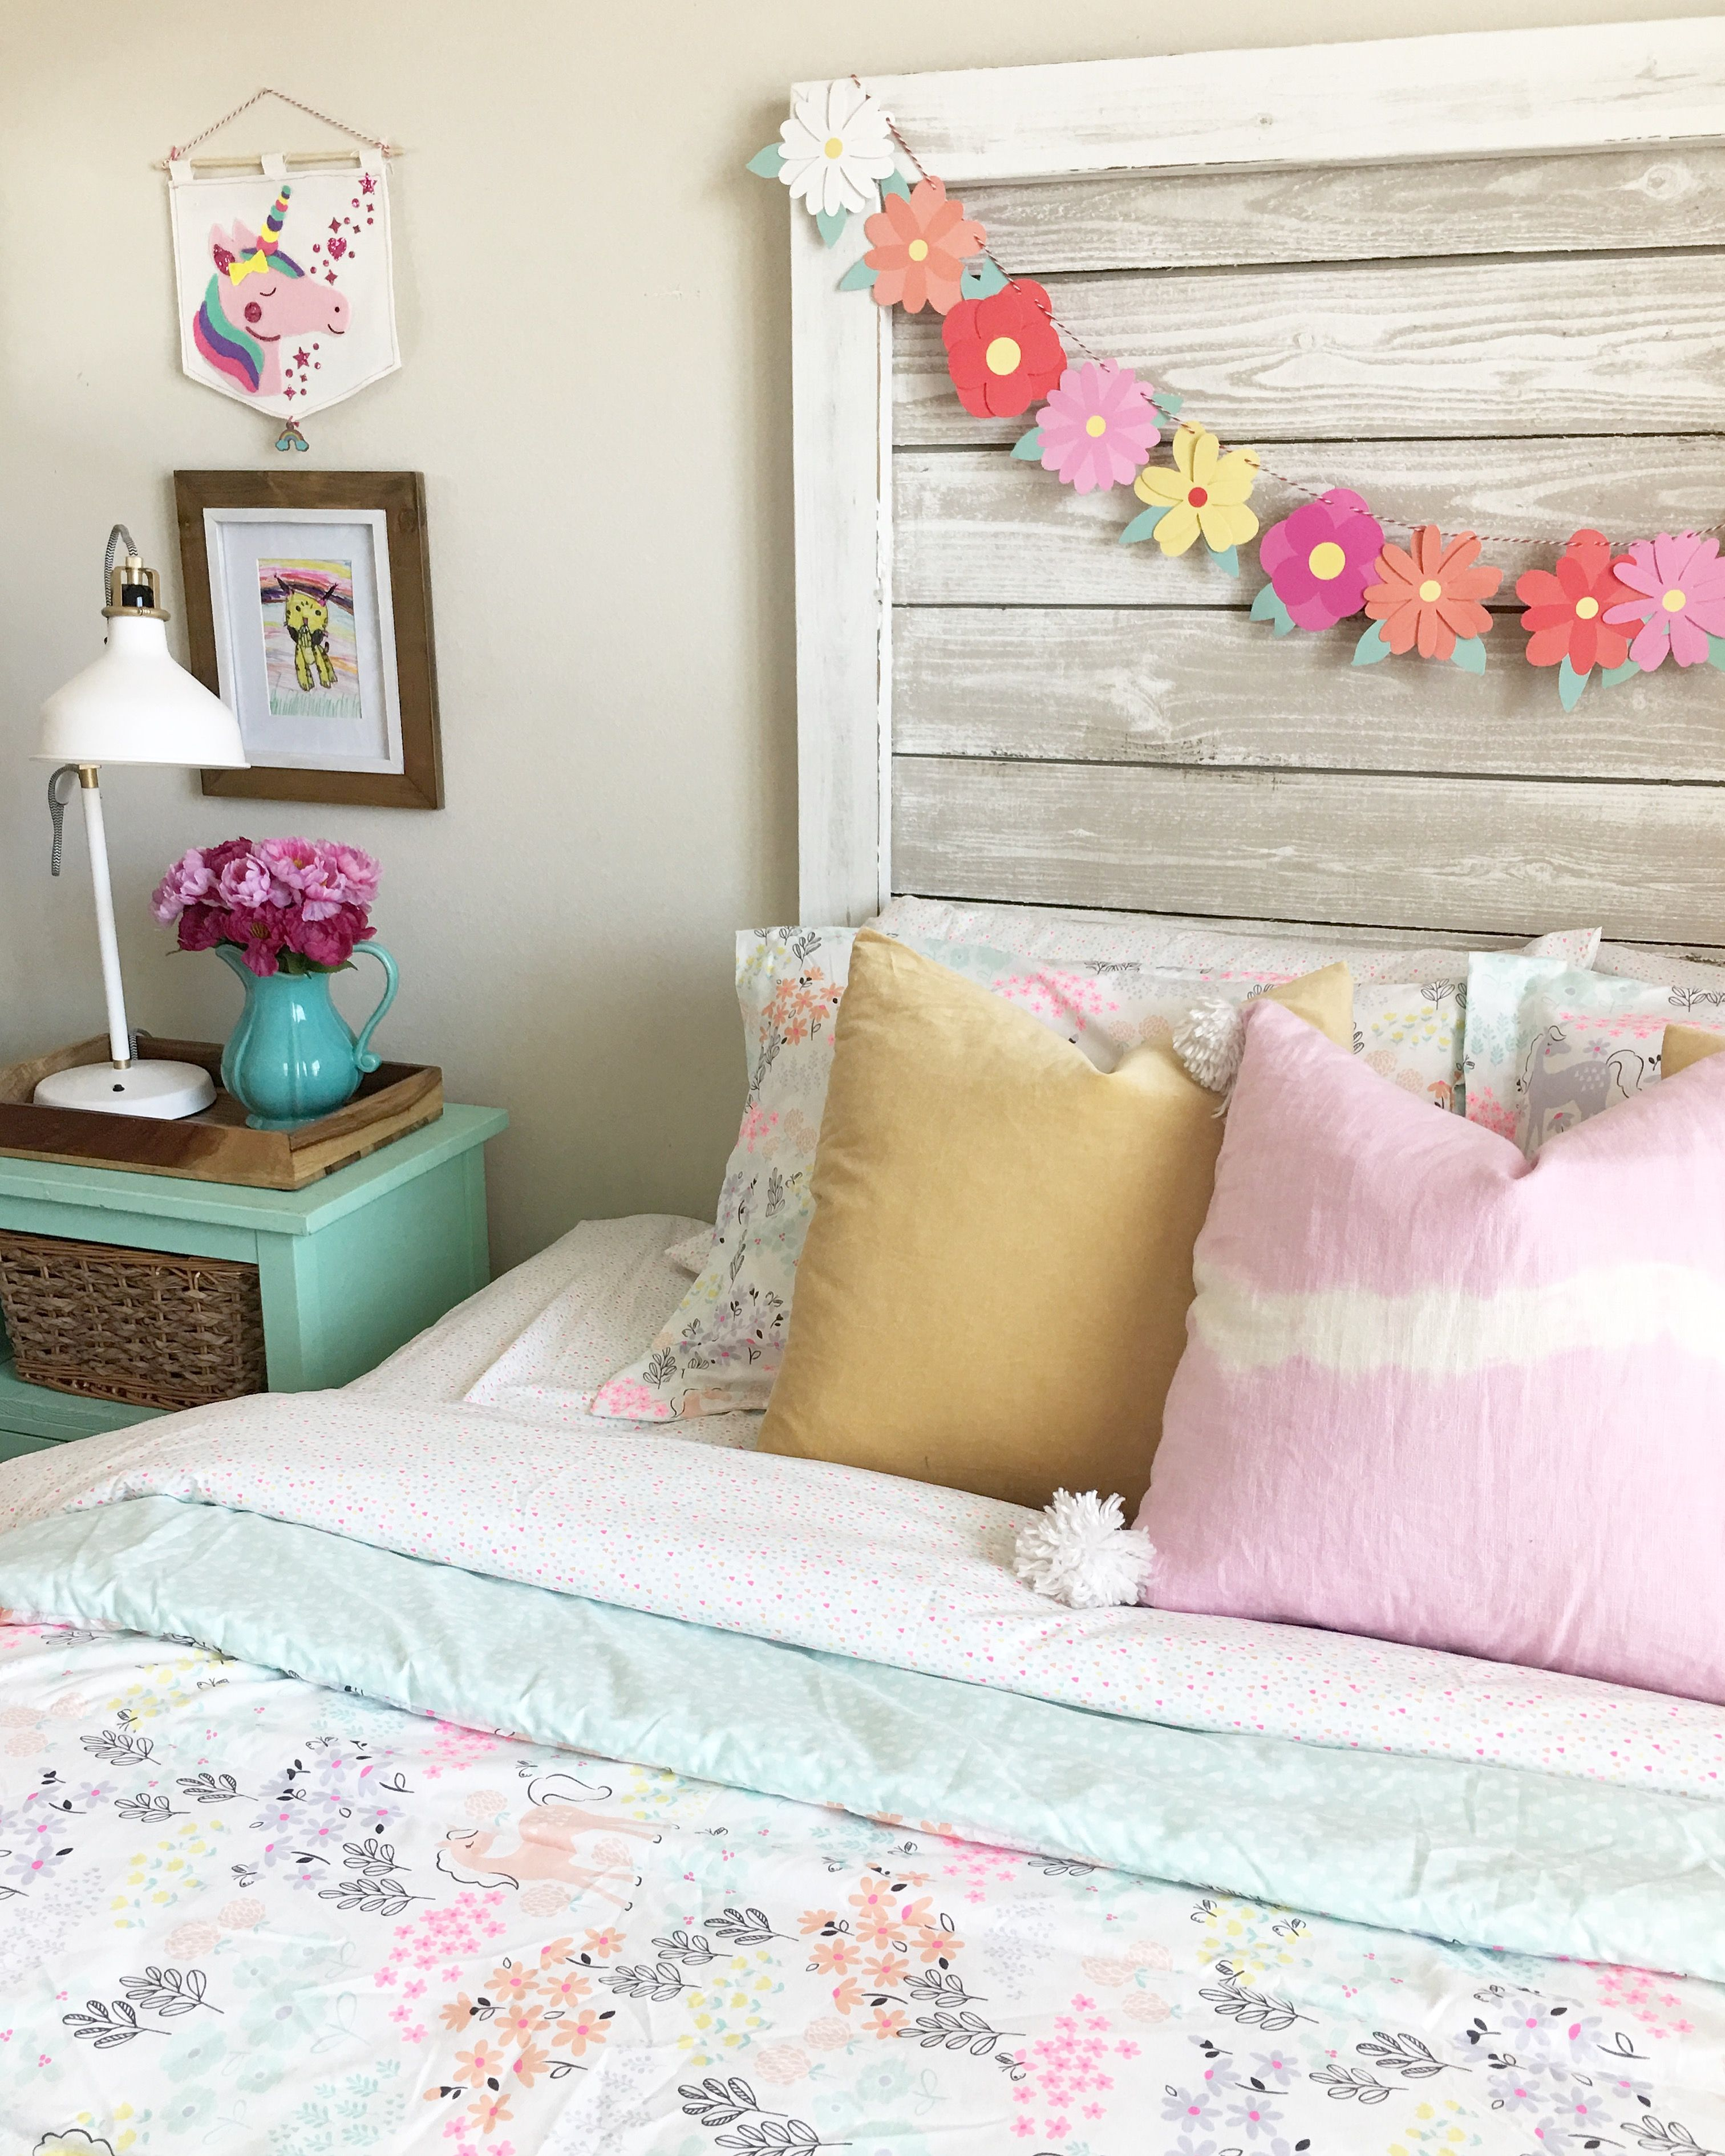 Little Girls Unicorn Room Bedroom And Bath Decor Pinterest Unicorns Room And Bedrooms